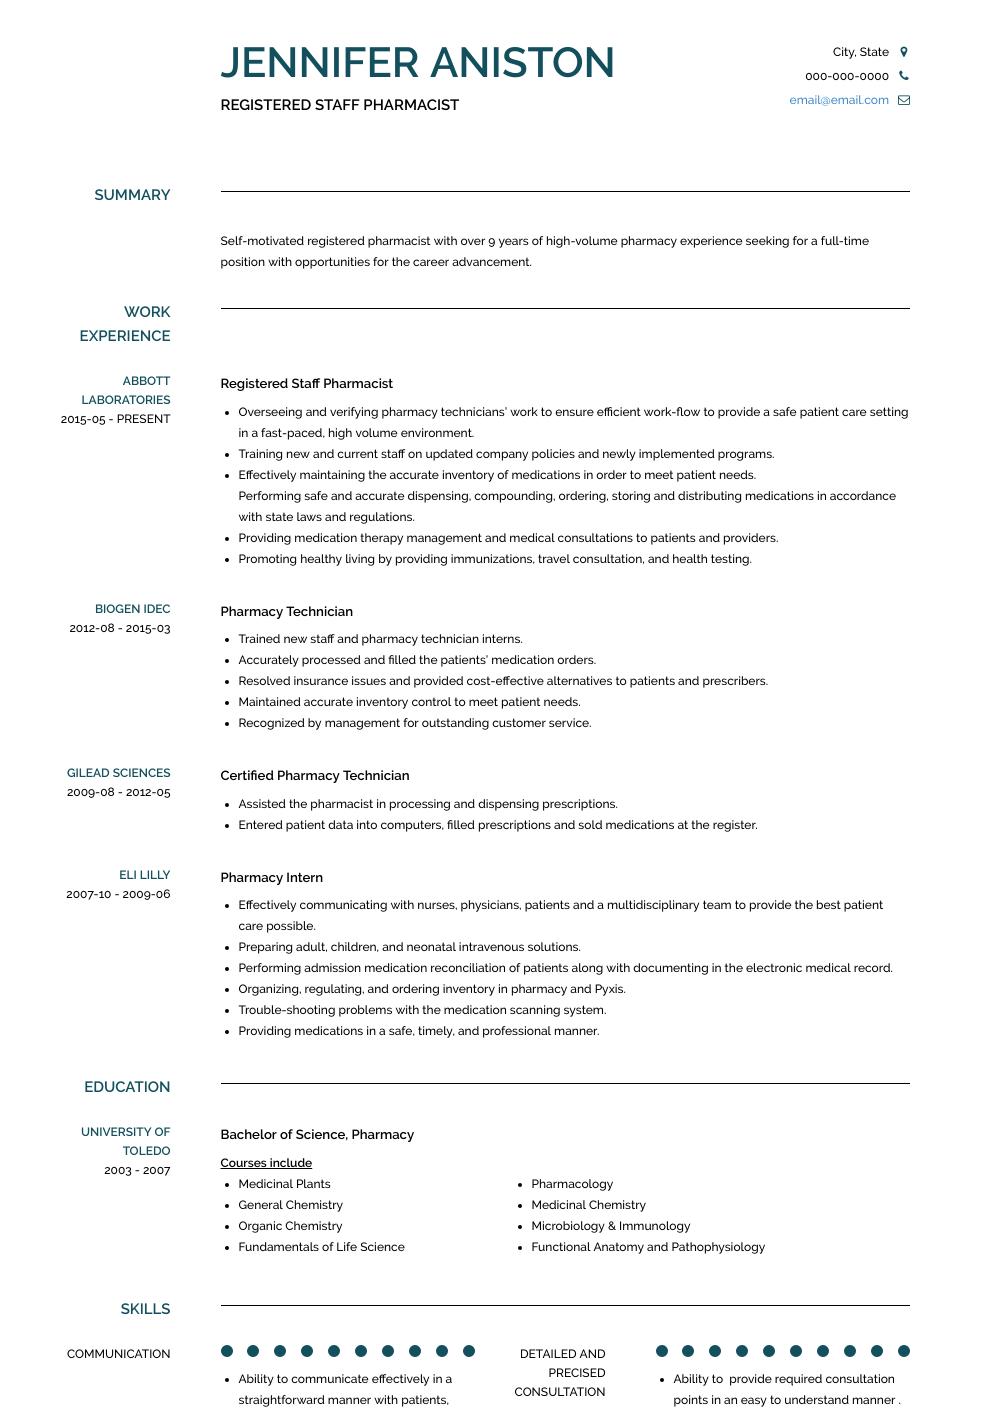 Registered Staff Pharmacist Resume Sample and Template